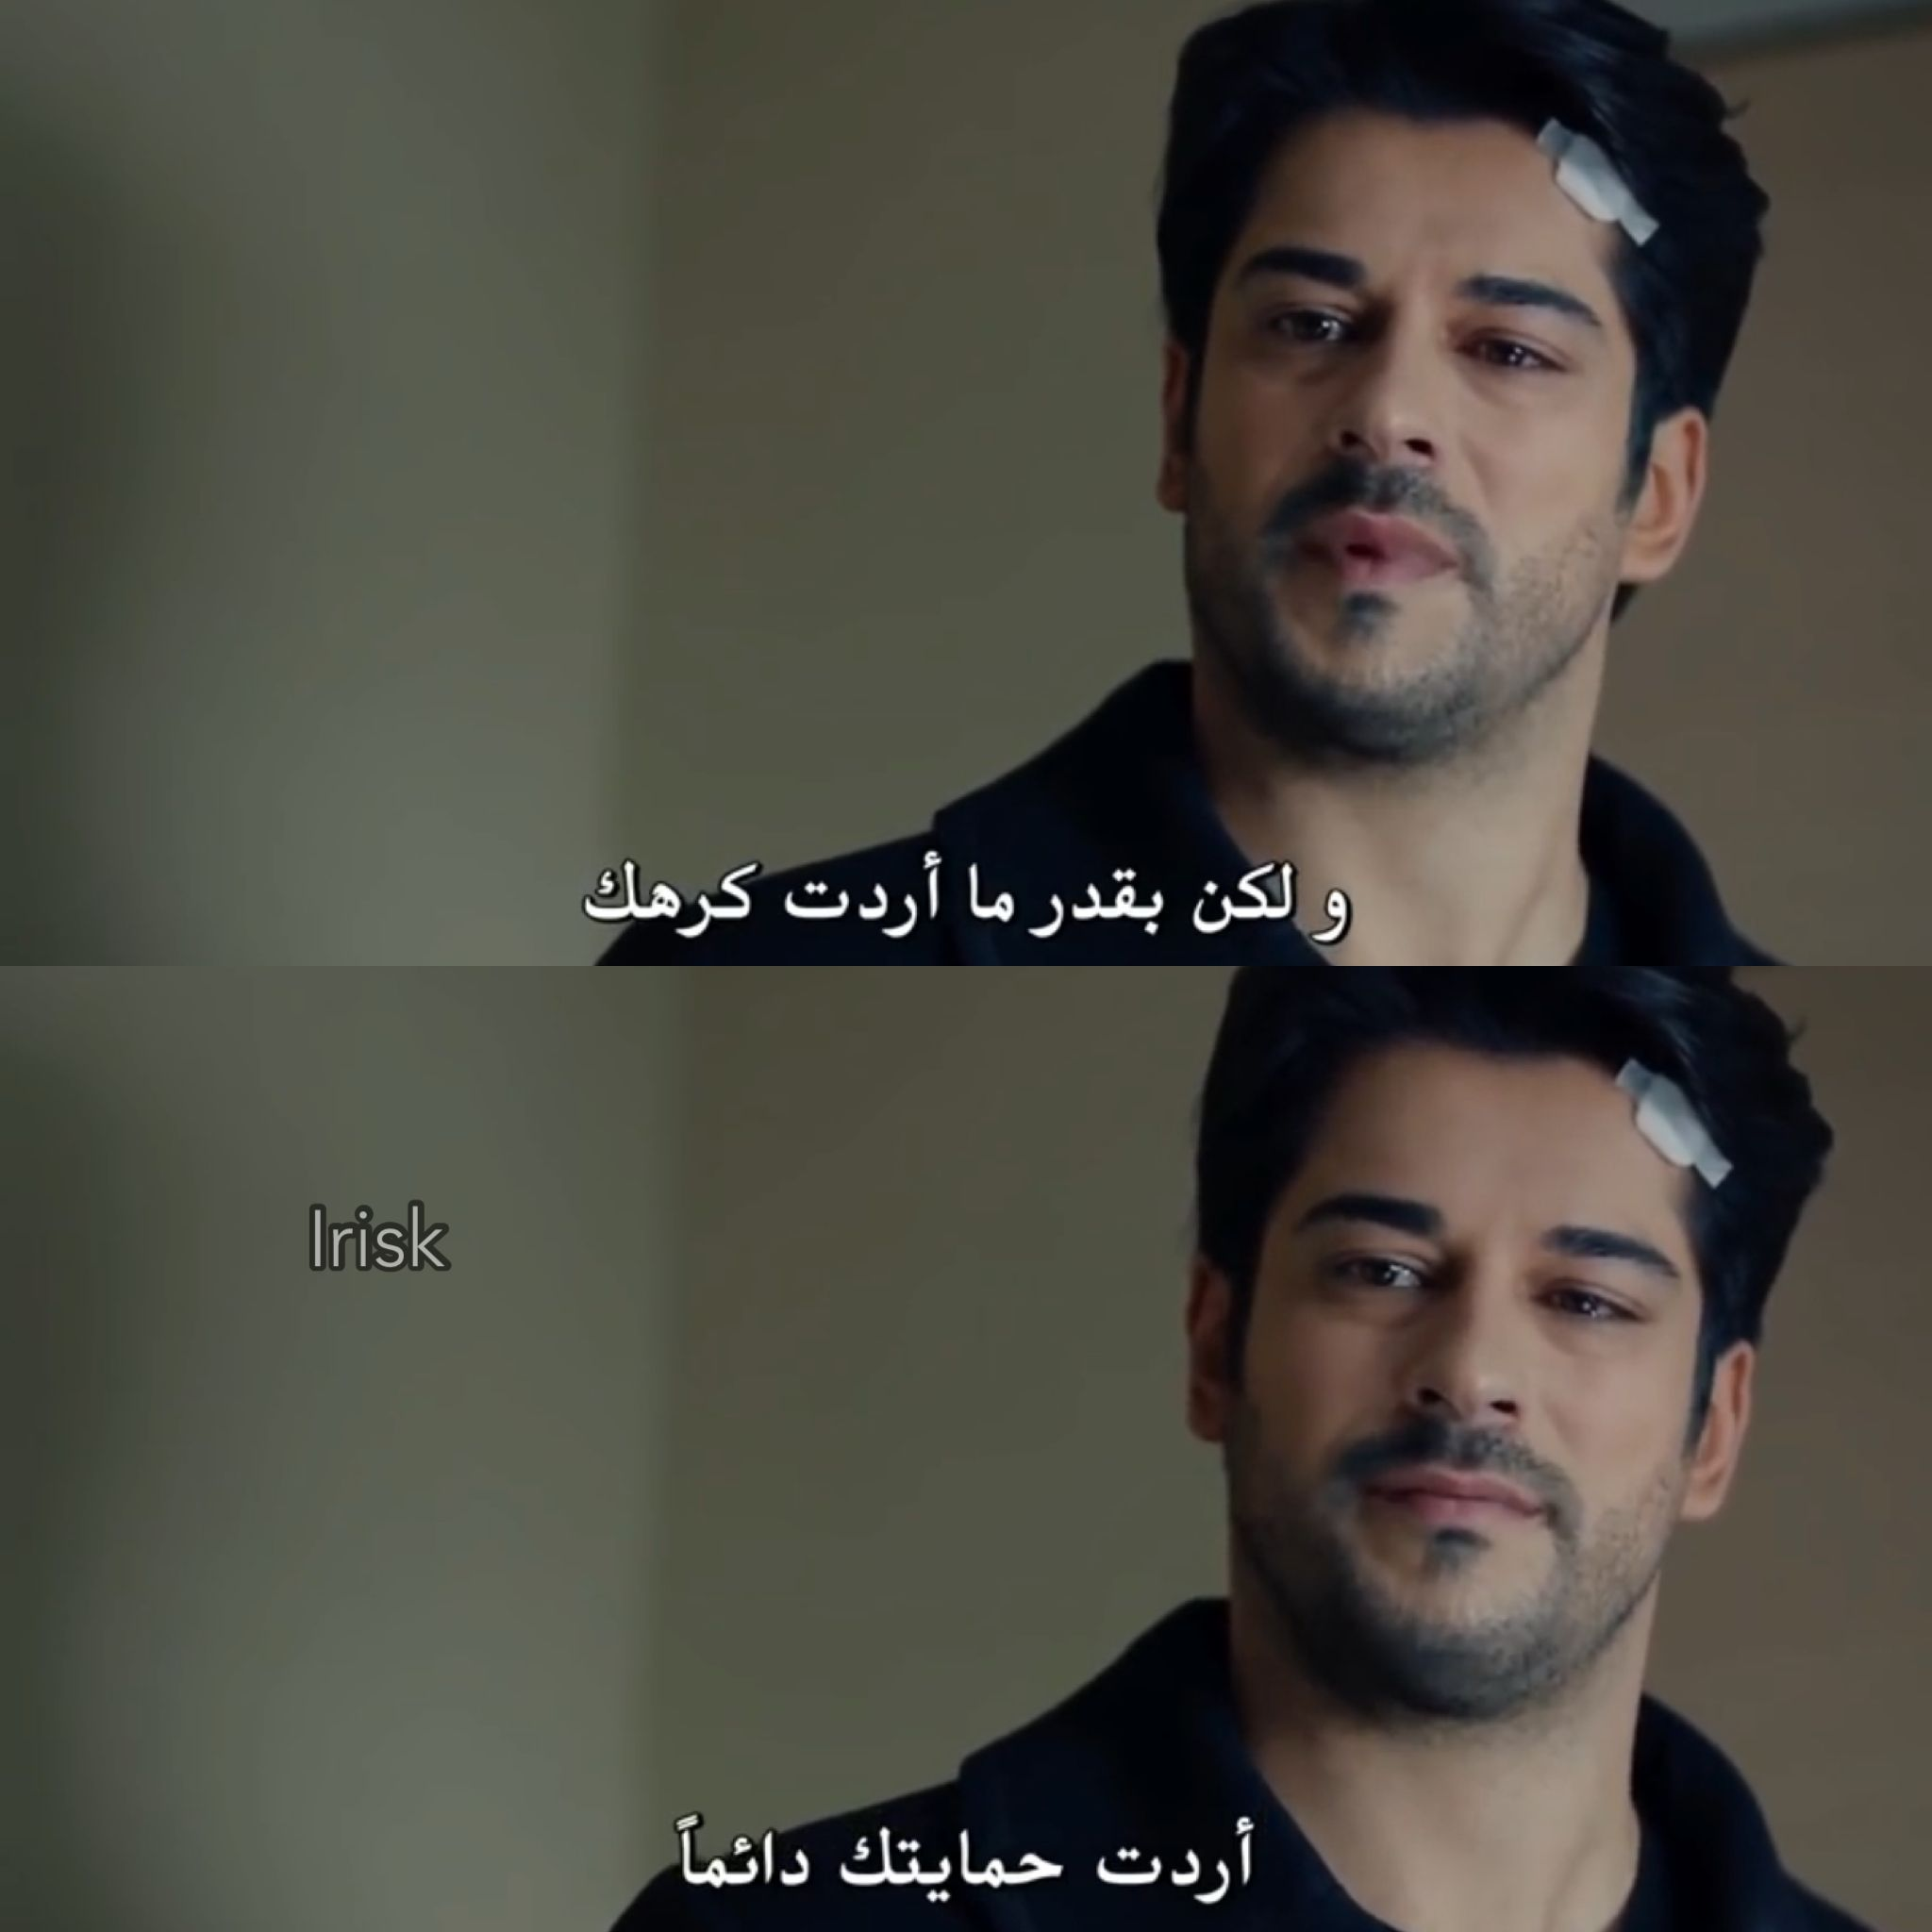 حب اعمى كماليم Kara Sevda Love Quotes With Images Cover Quotes Turkish Quotes